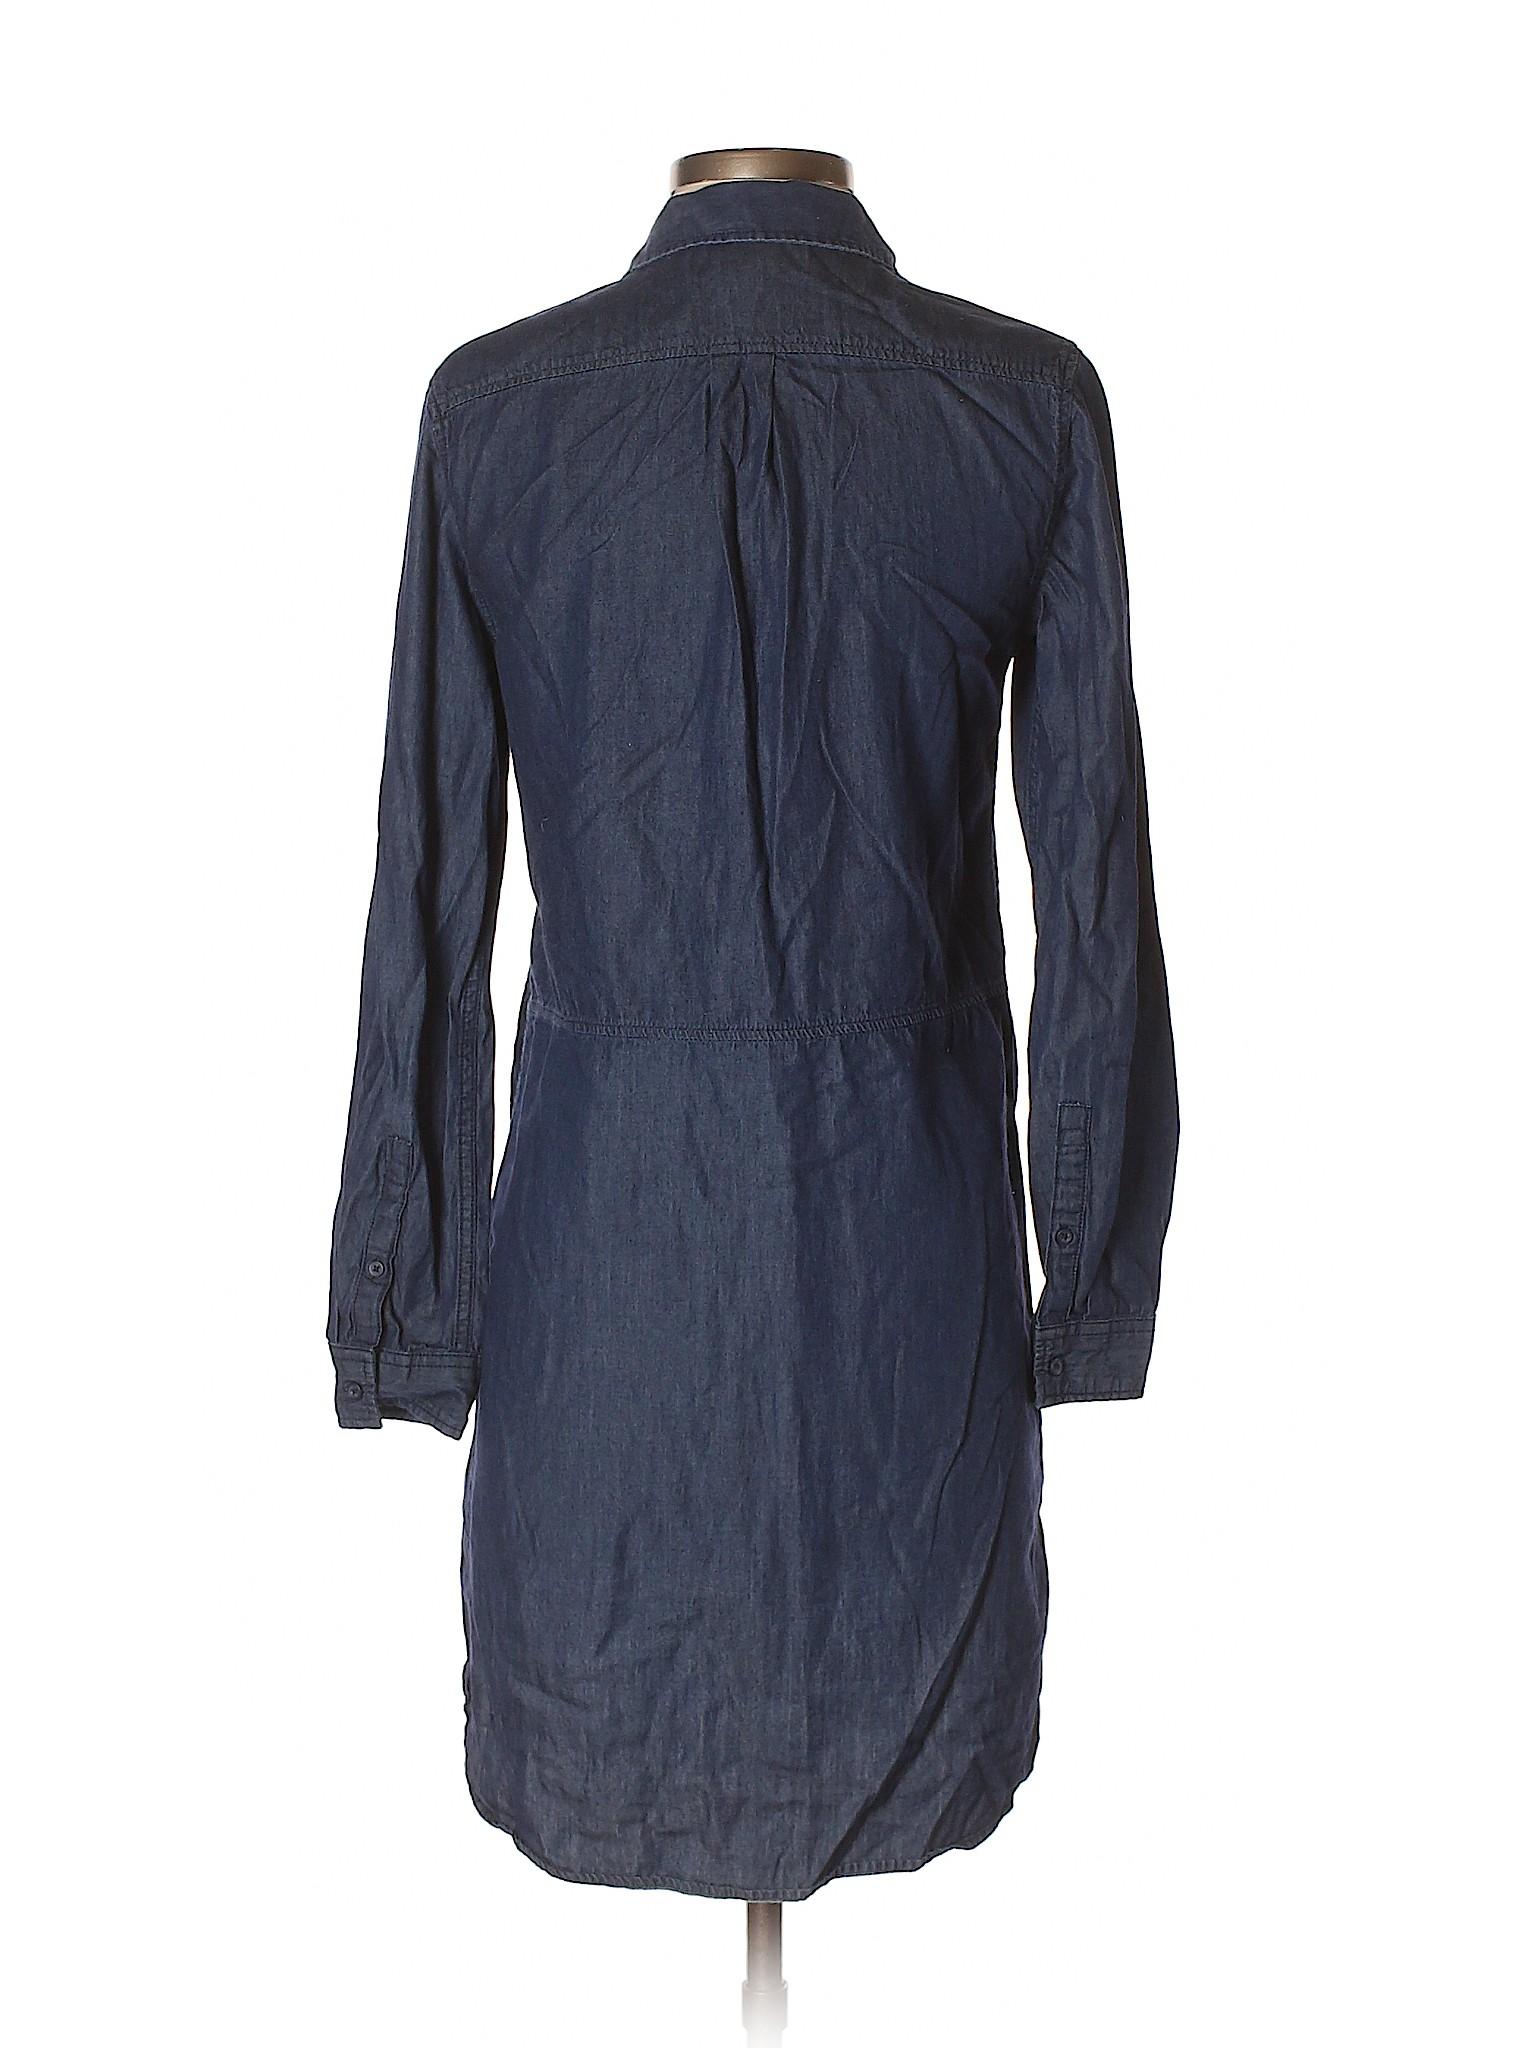 Selling Casual Fresh Dress Selling Joe Casual Selling Joe Joe Fresh Fresh Casual Dress Dress w4qEzn1T